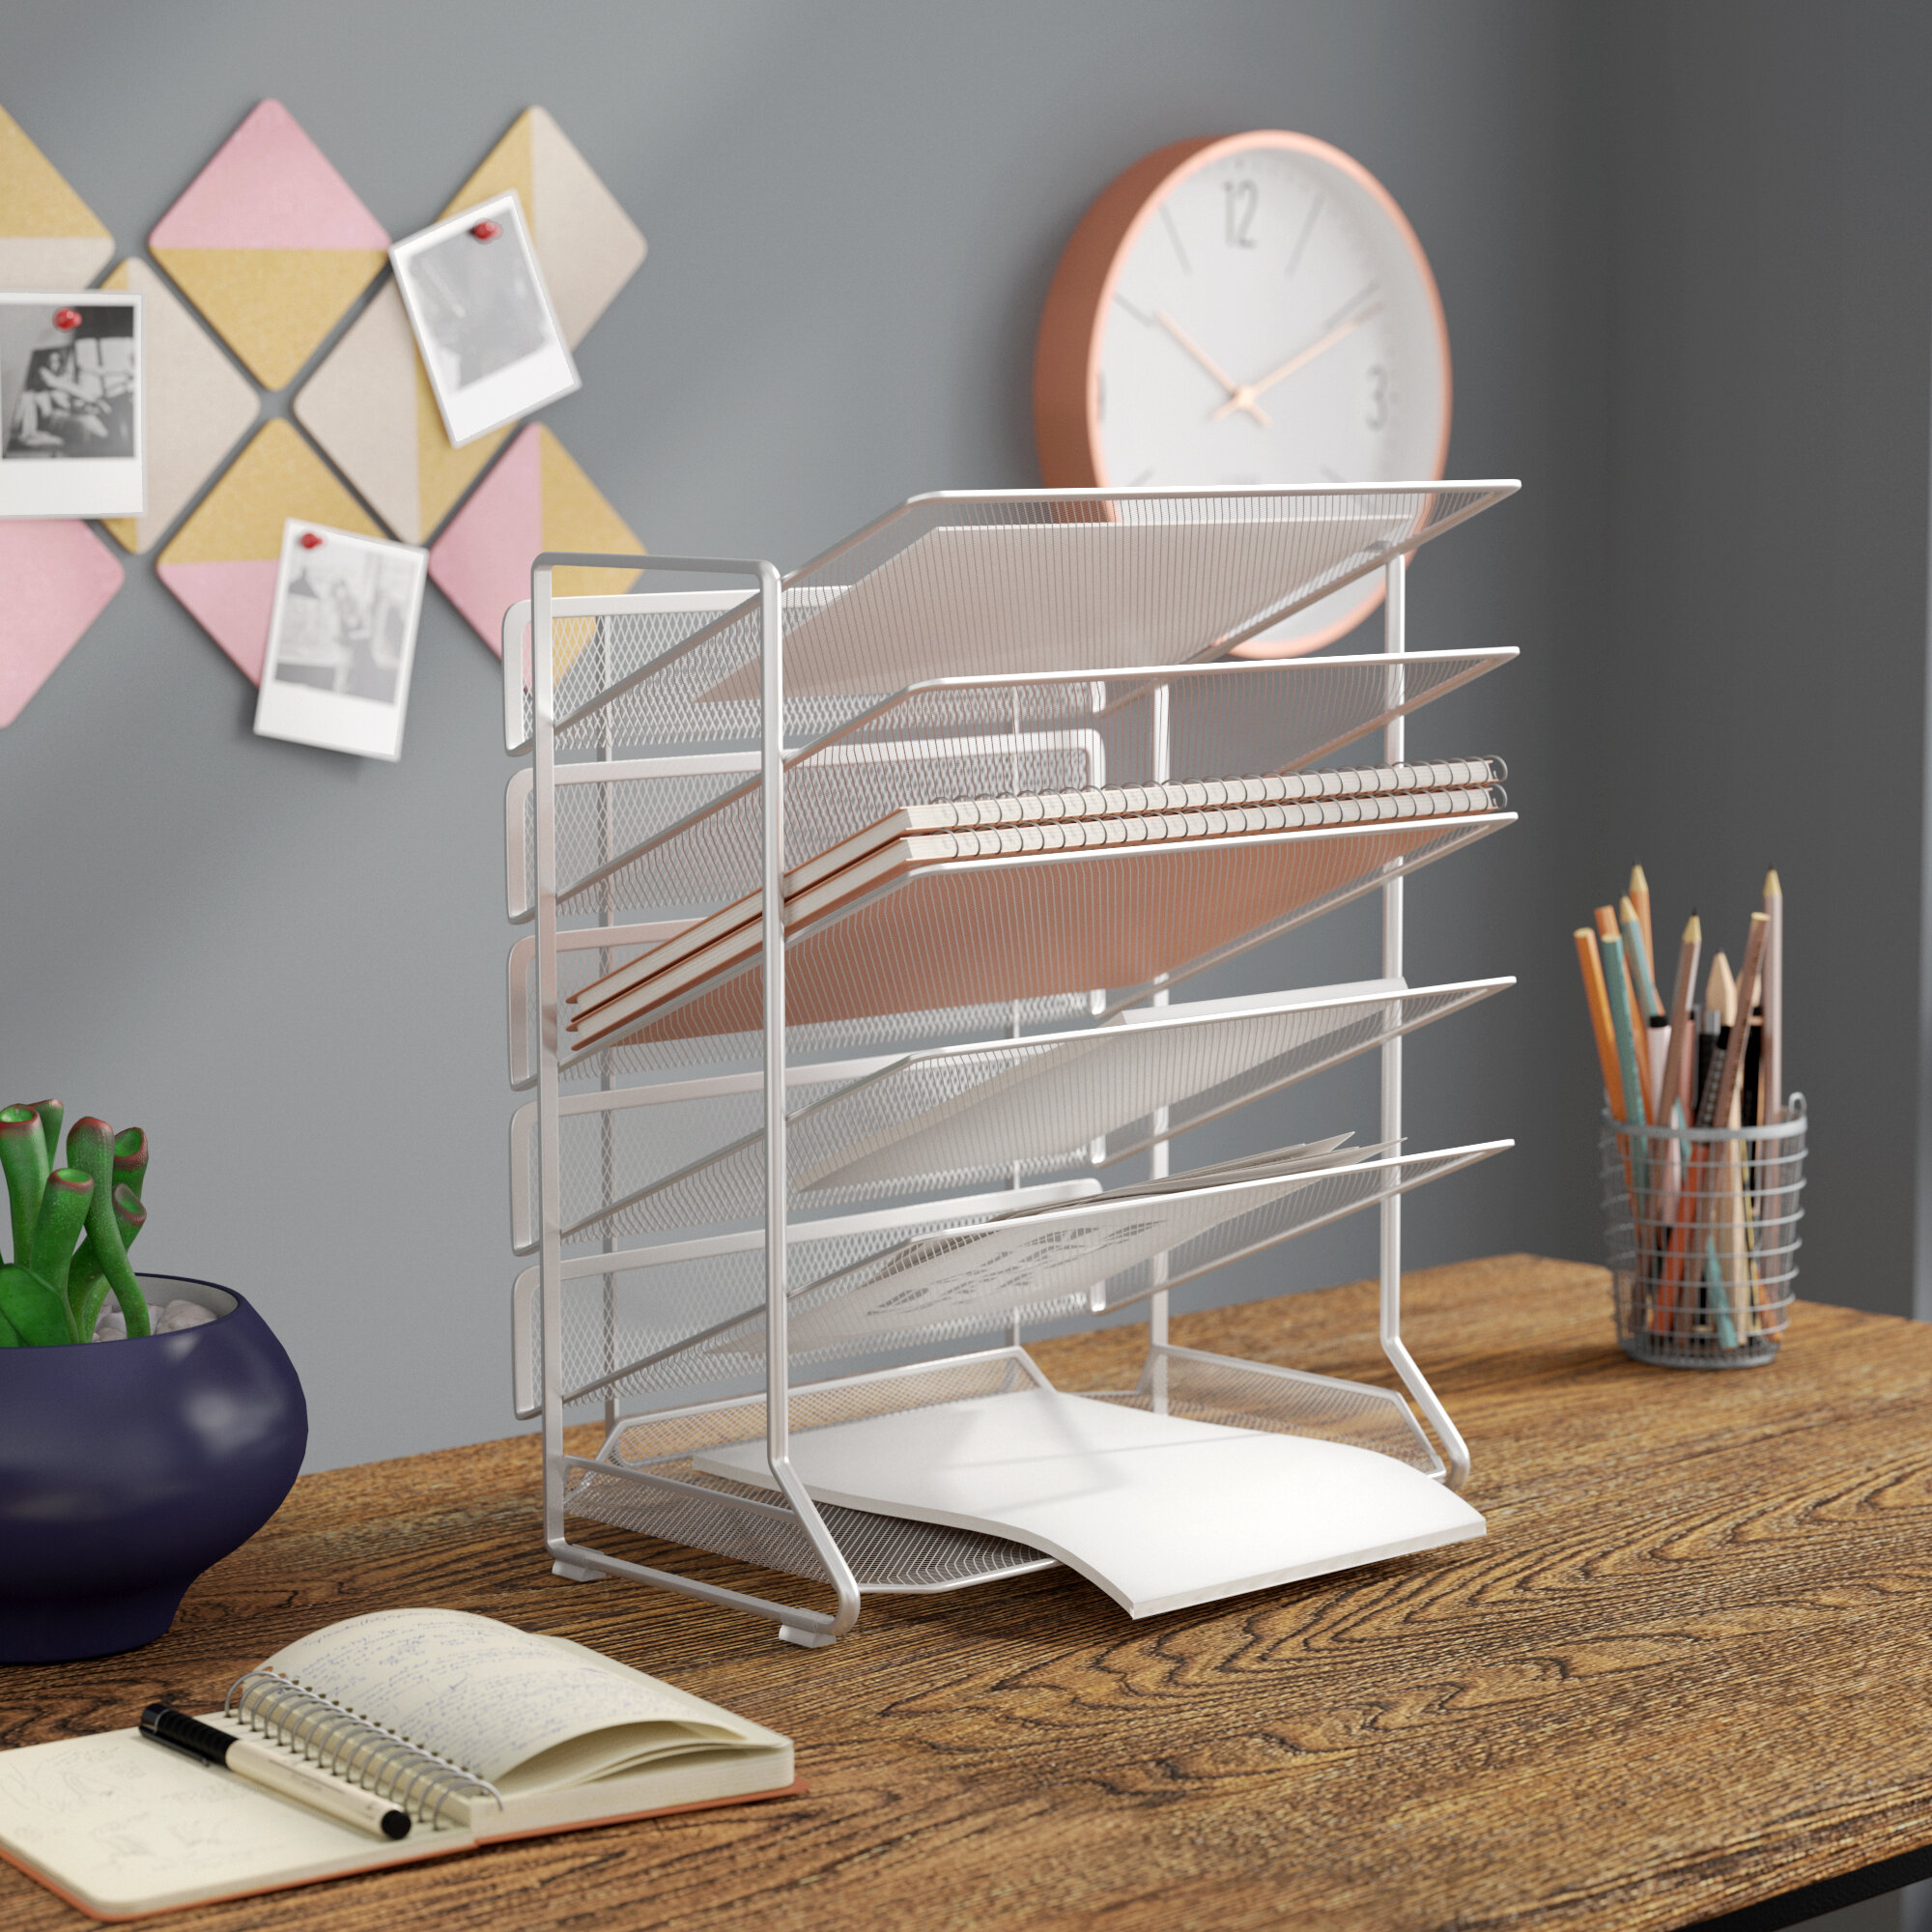 Strange Dwain Office Desk Organizer Home Remodeling Inspirations Cosmcuboardxyz